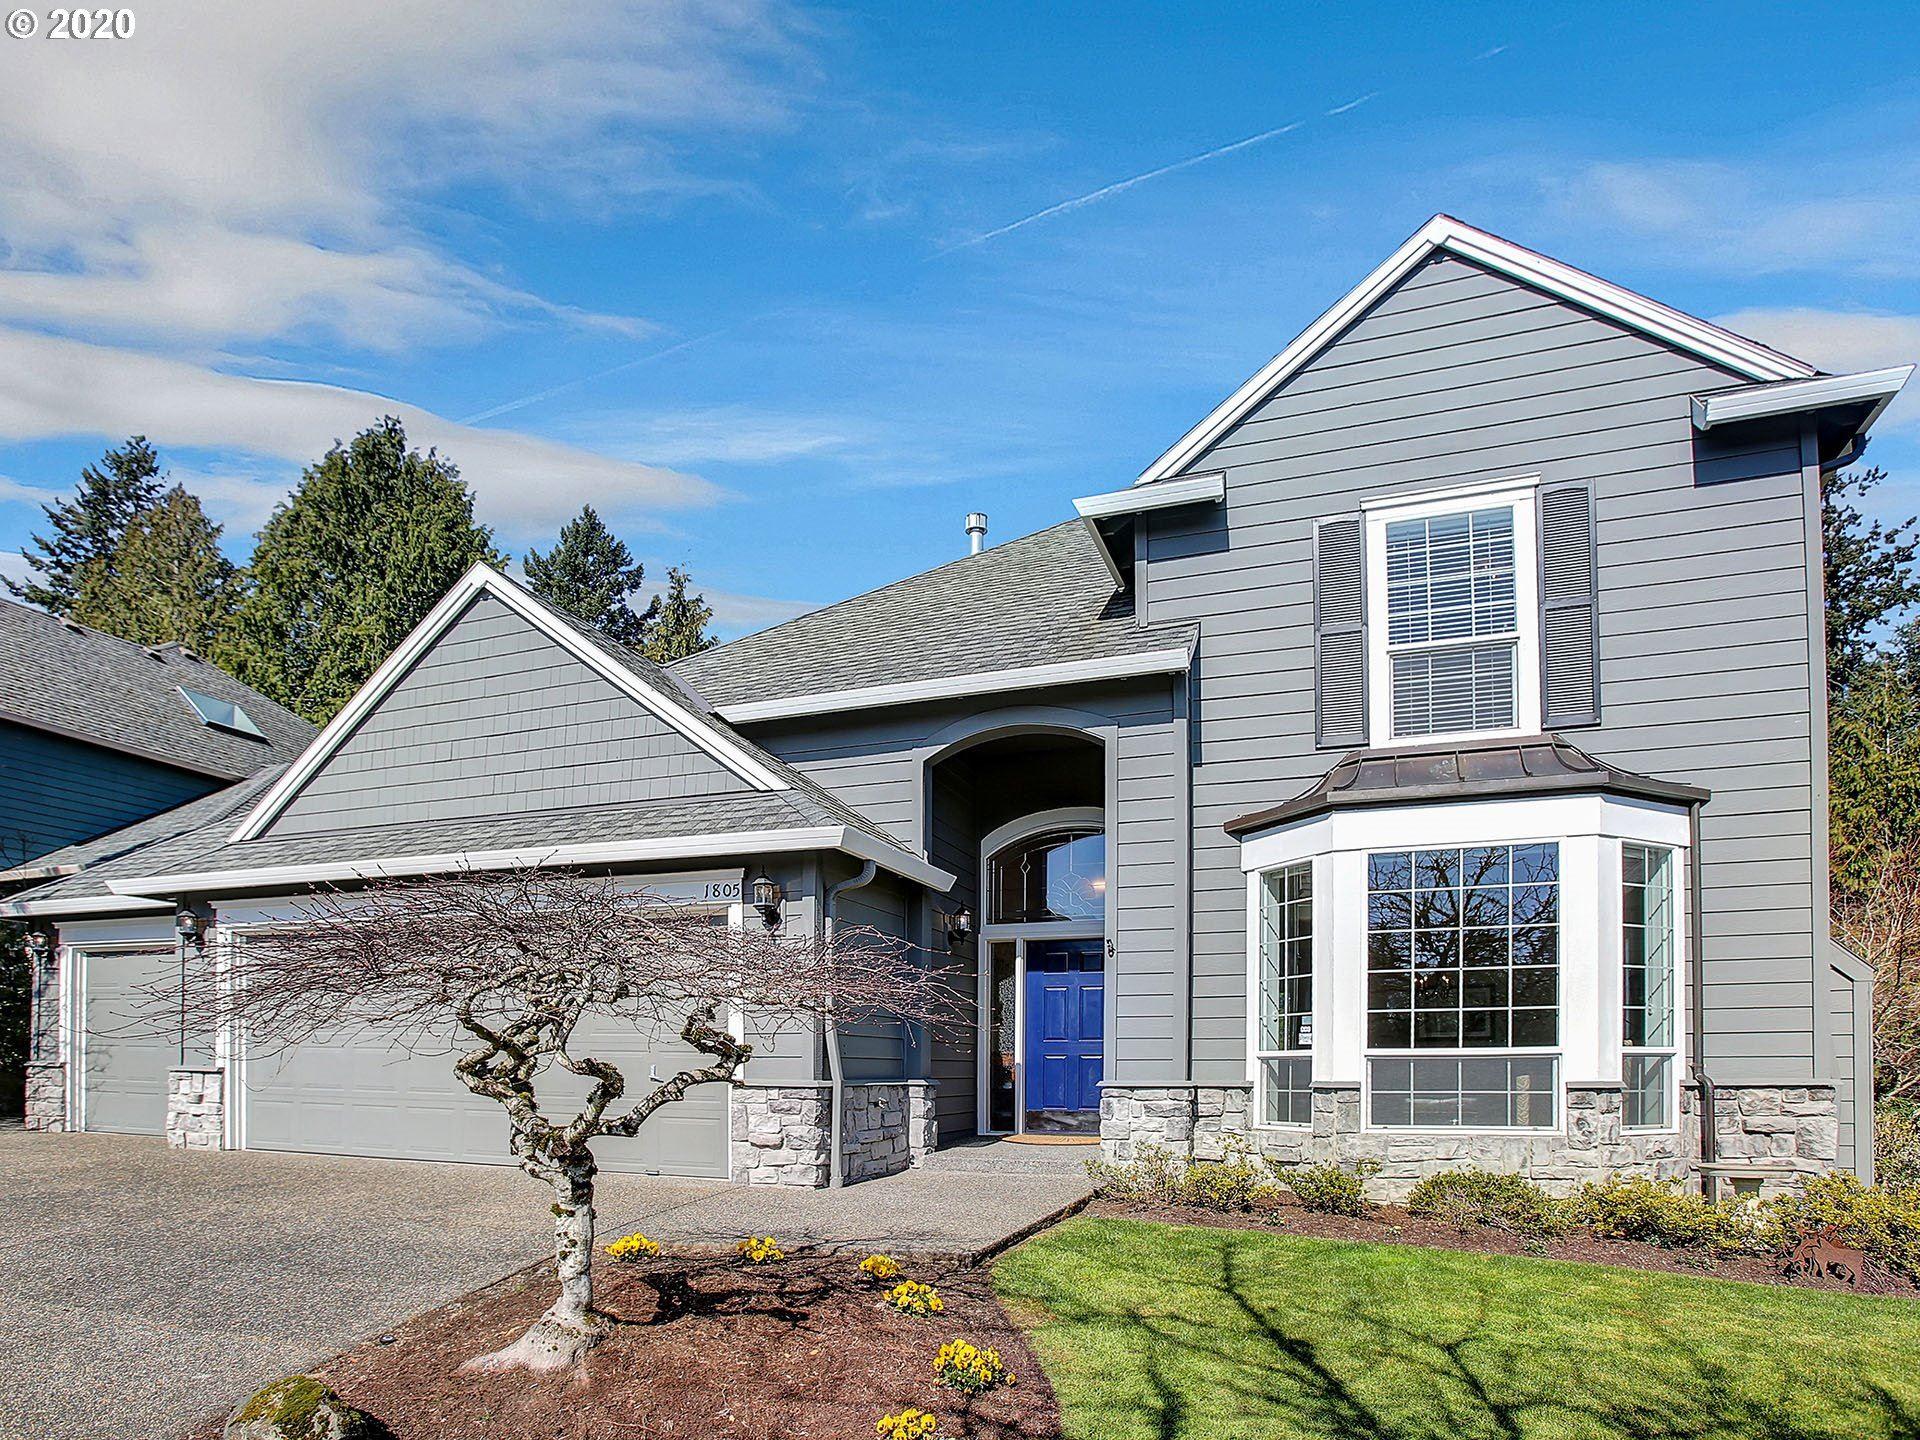 1805 SW JOSHUA ST, Portland, OR 97219 - MLS#: 20145075